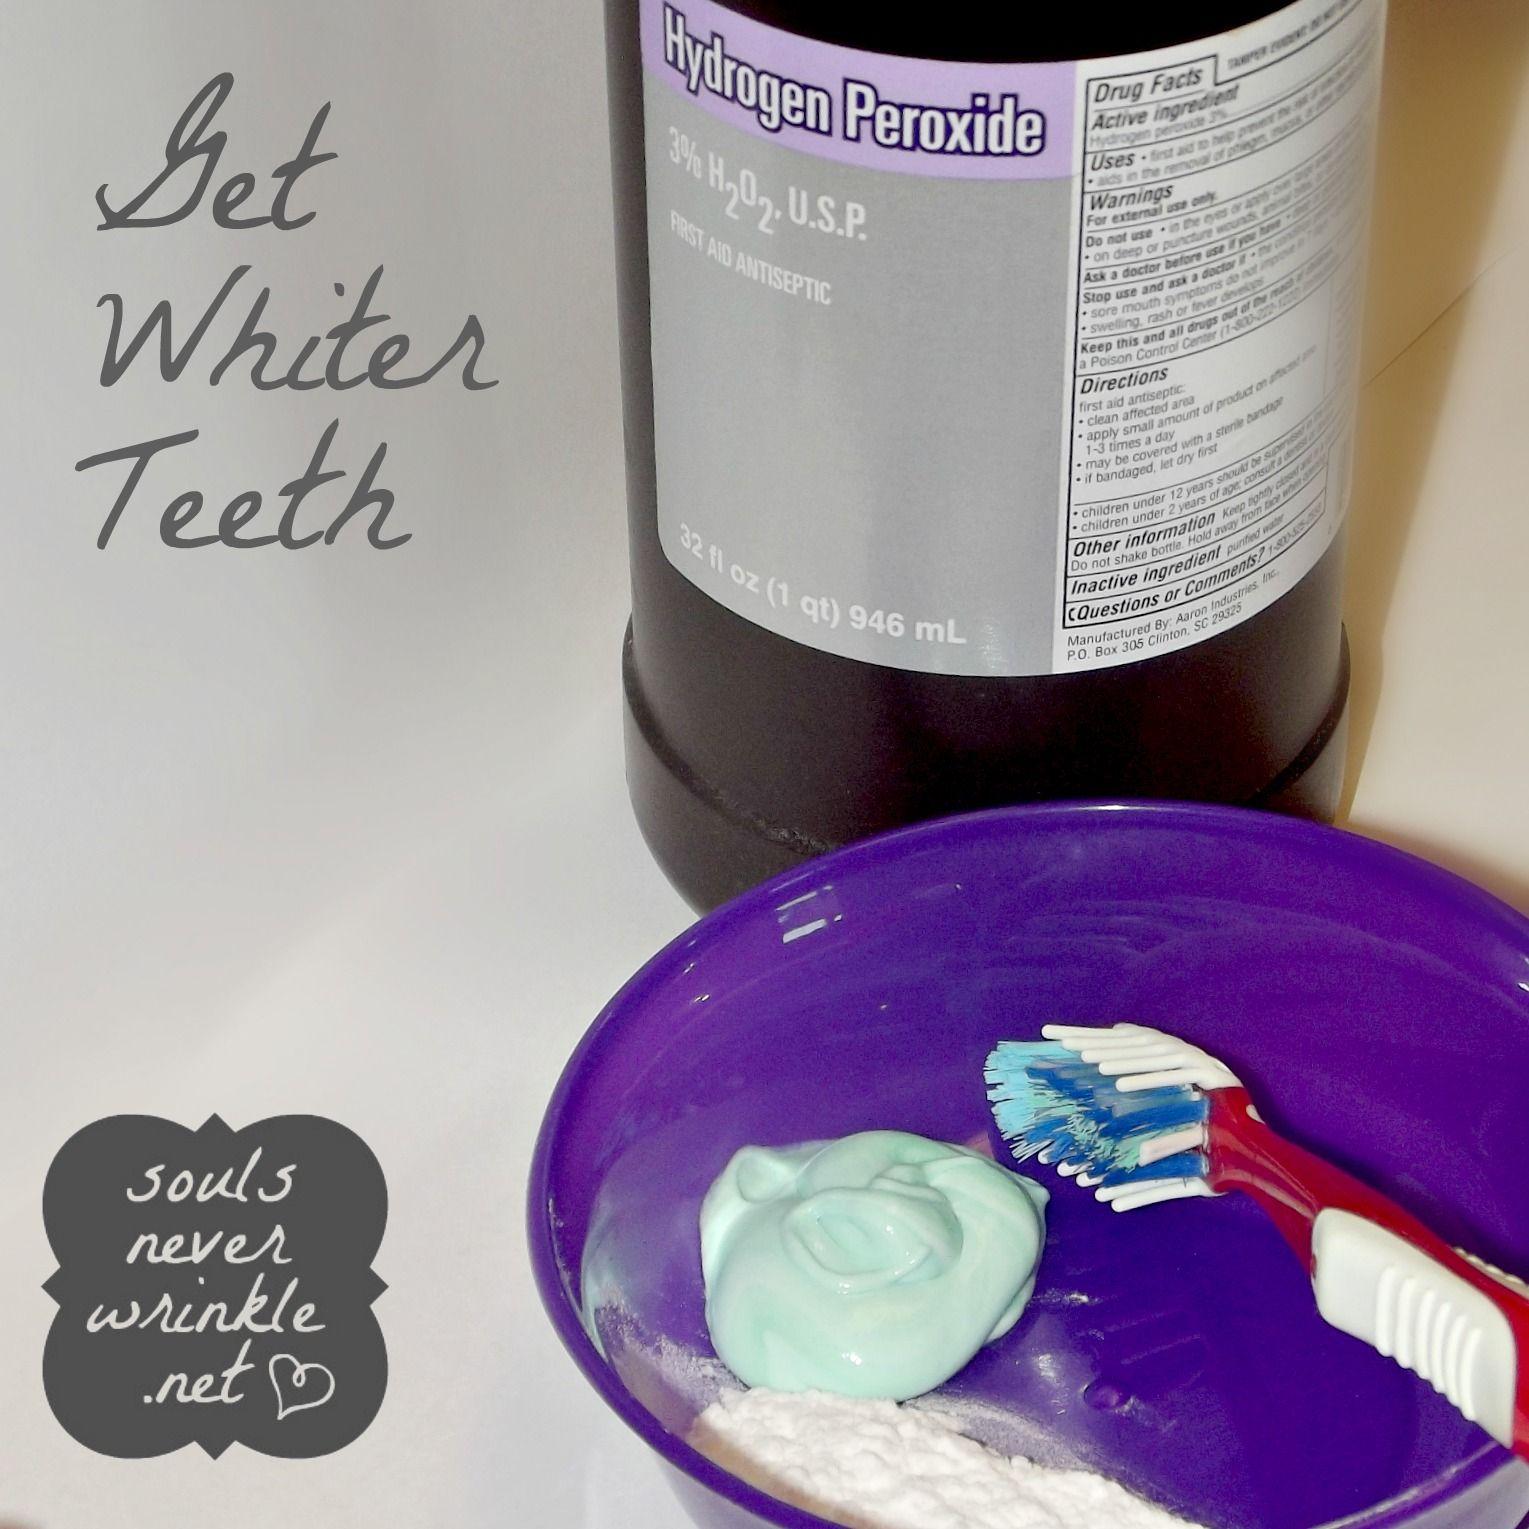 get white teeth